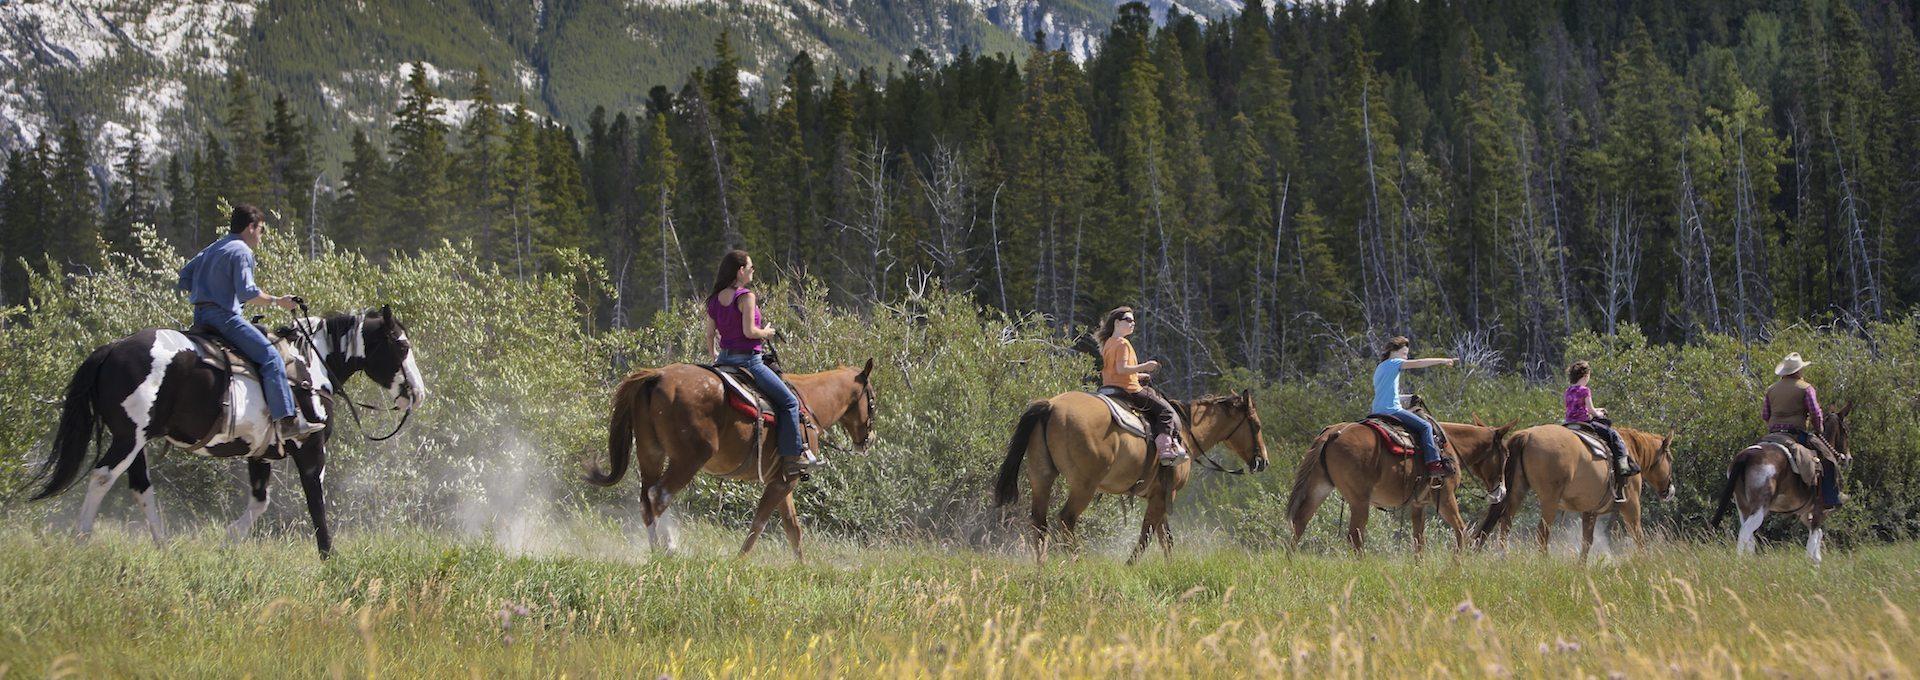 Horseback Ride – Bow Valley Loop 3 Hrs